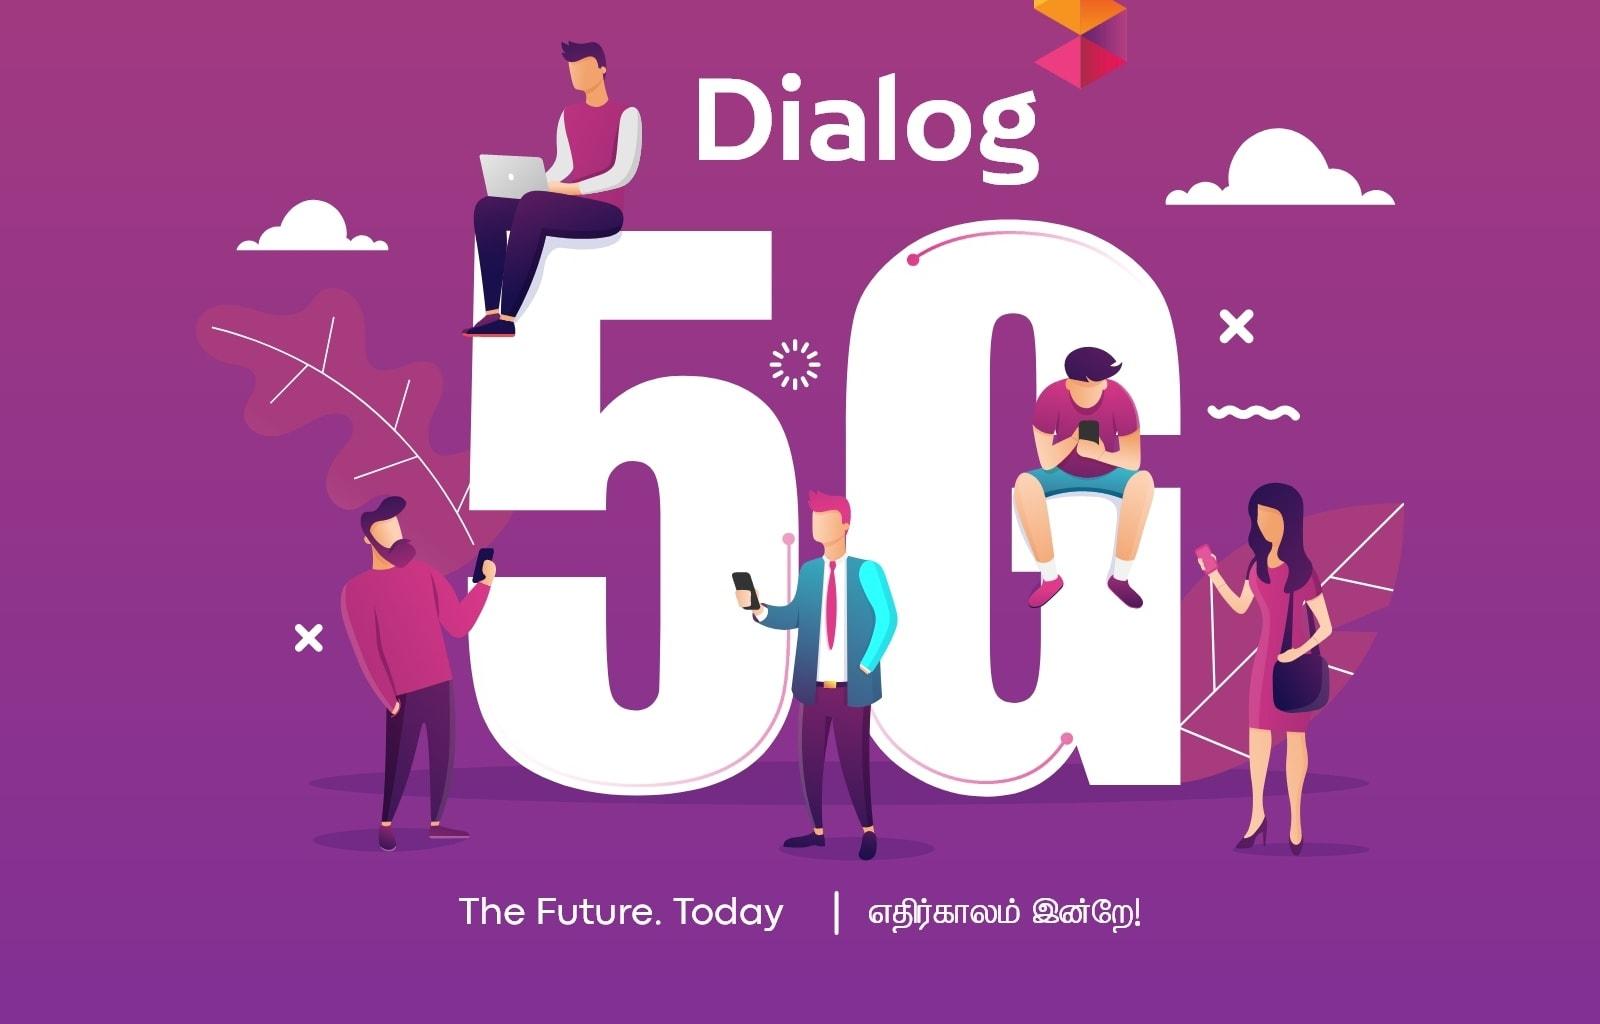 Dialog 5G